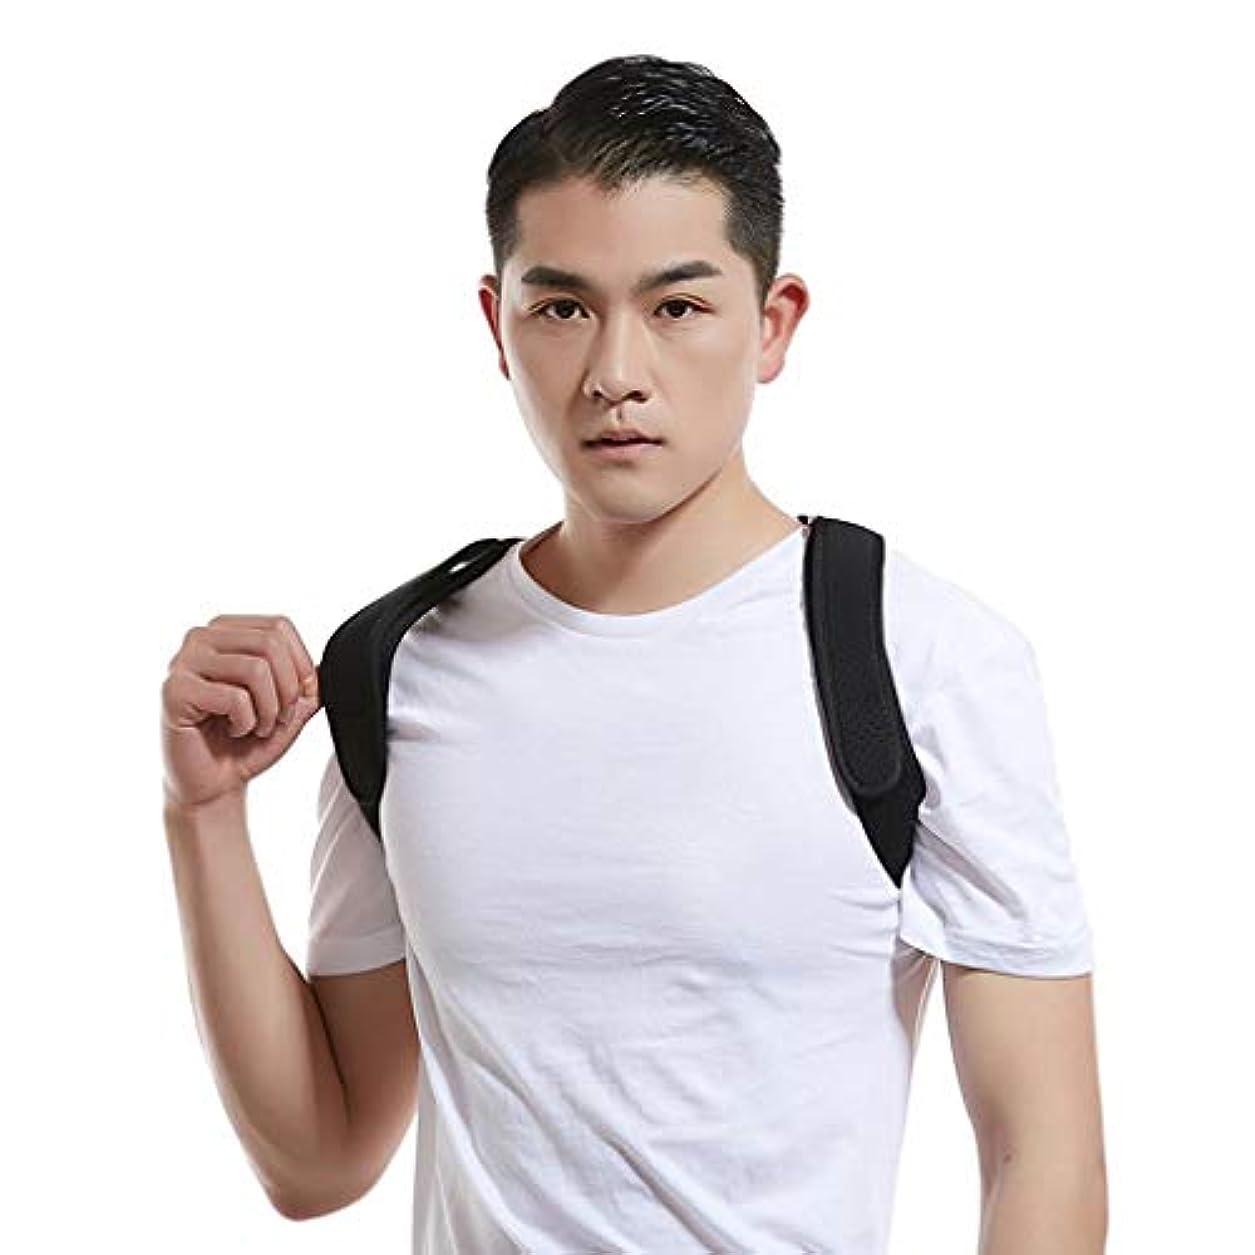 KKCD - 矯正ベルト プロの姿勢によって男性のための姿勢補正 - 男性の体のために設計されたバックブレースの姿勢補正 - インスタント&長期的な痛みの軽減のためのバックサポート - 服の下に見えない